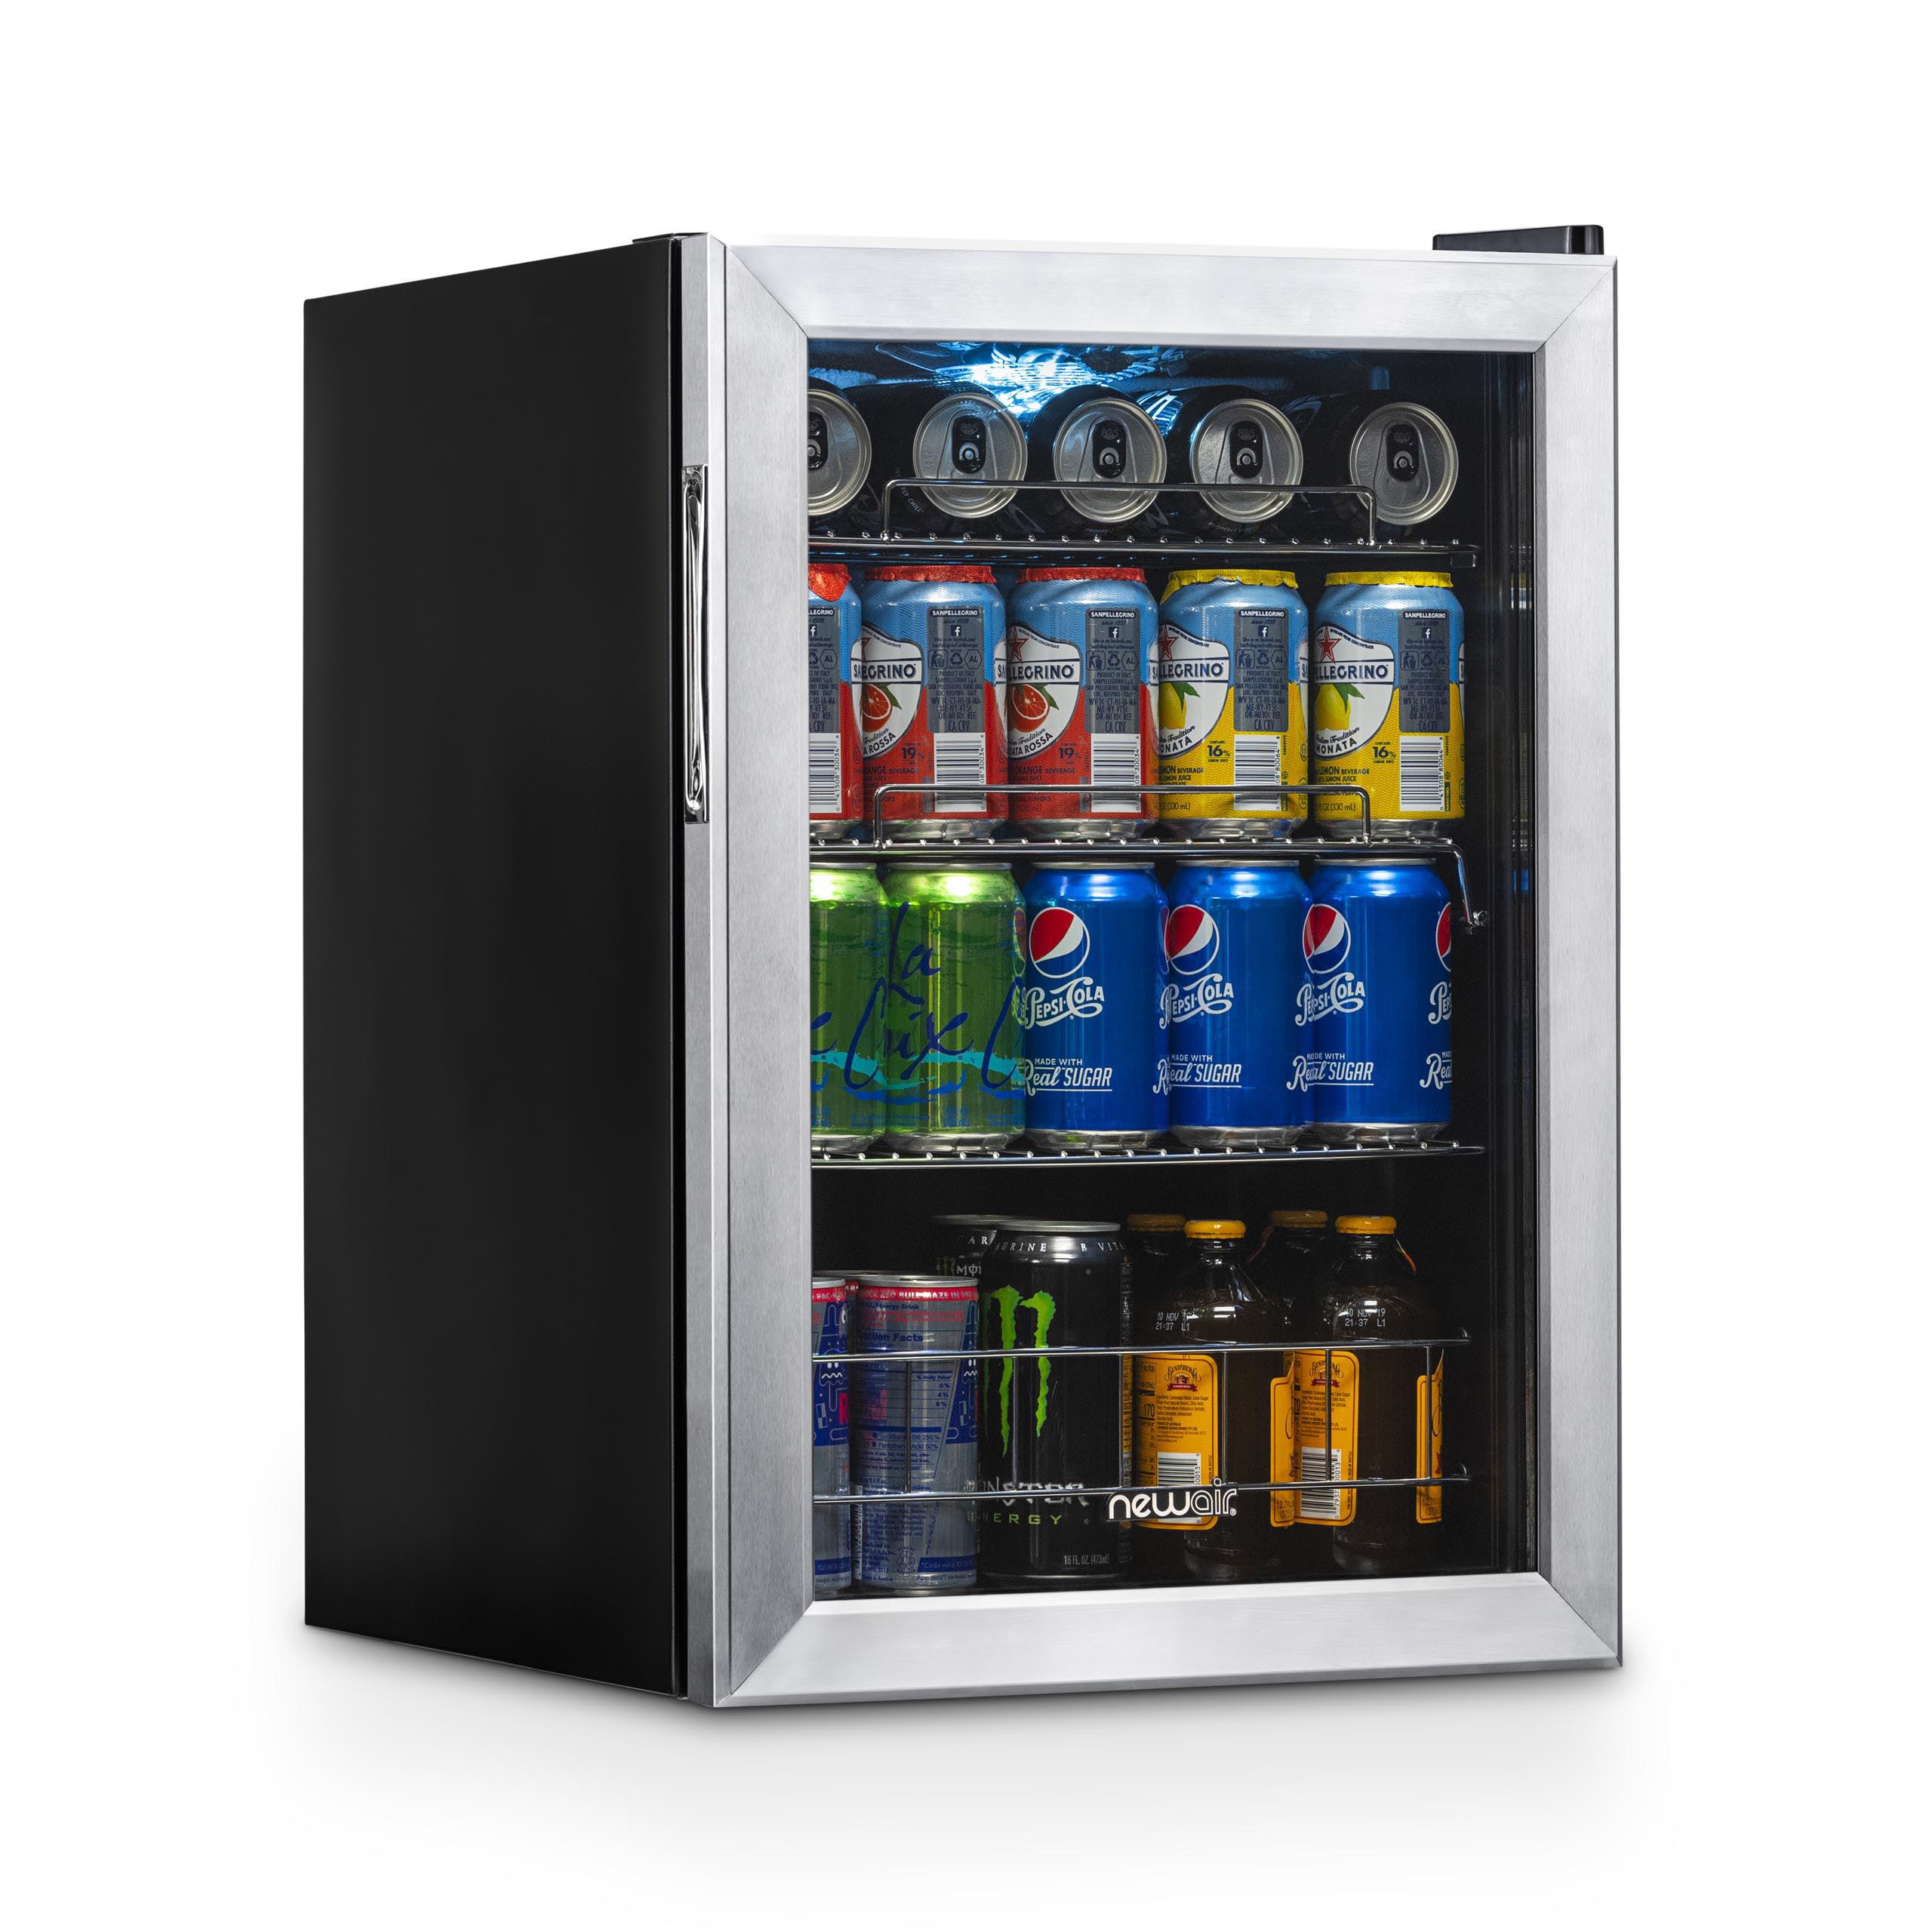 Newair Beverage Refrigerator 84 Can Capacity Center Soda Beer Cooler Ab 850 Stainless Steel Walmart Com Walmart Com